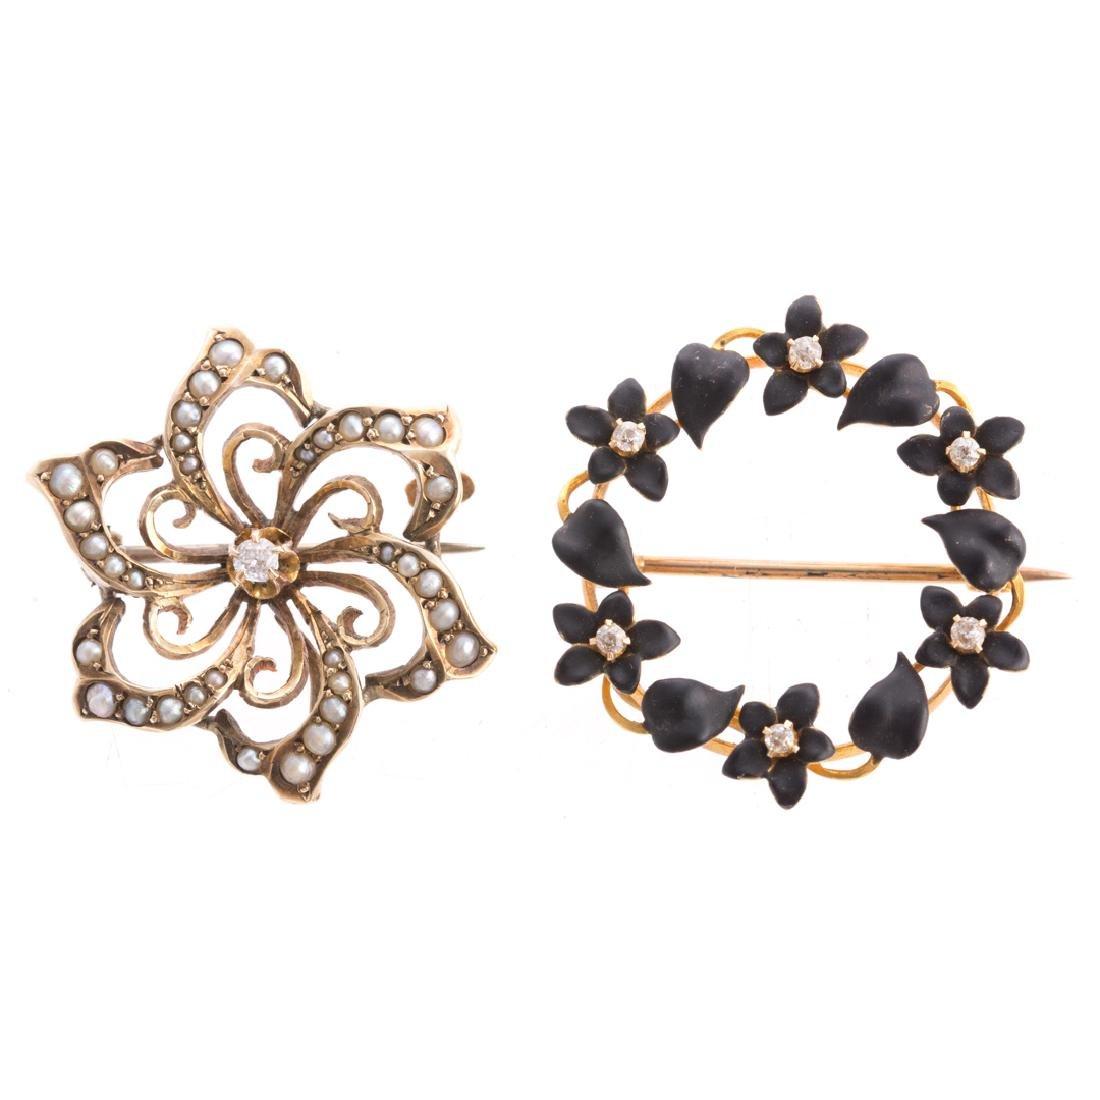 A Pair of Art Nouveau Enamel, Pearl & Diamond Pins